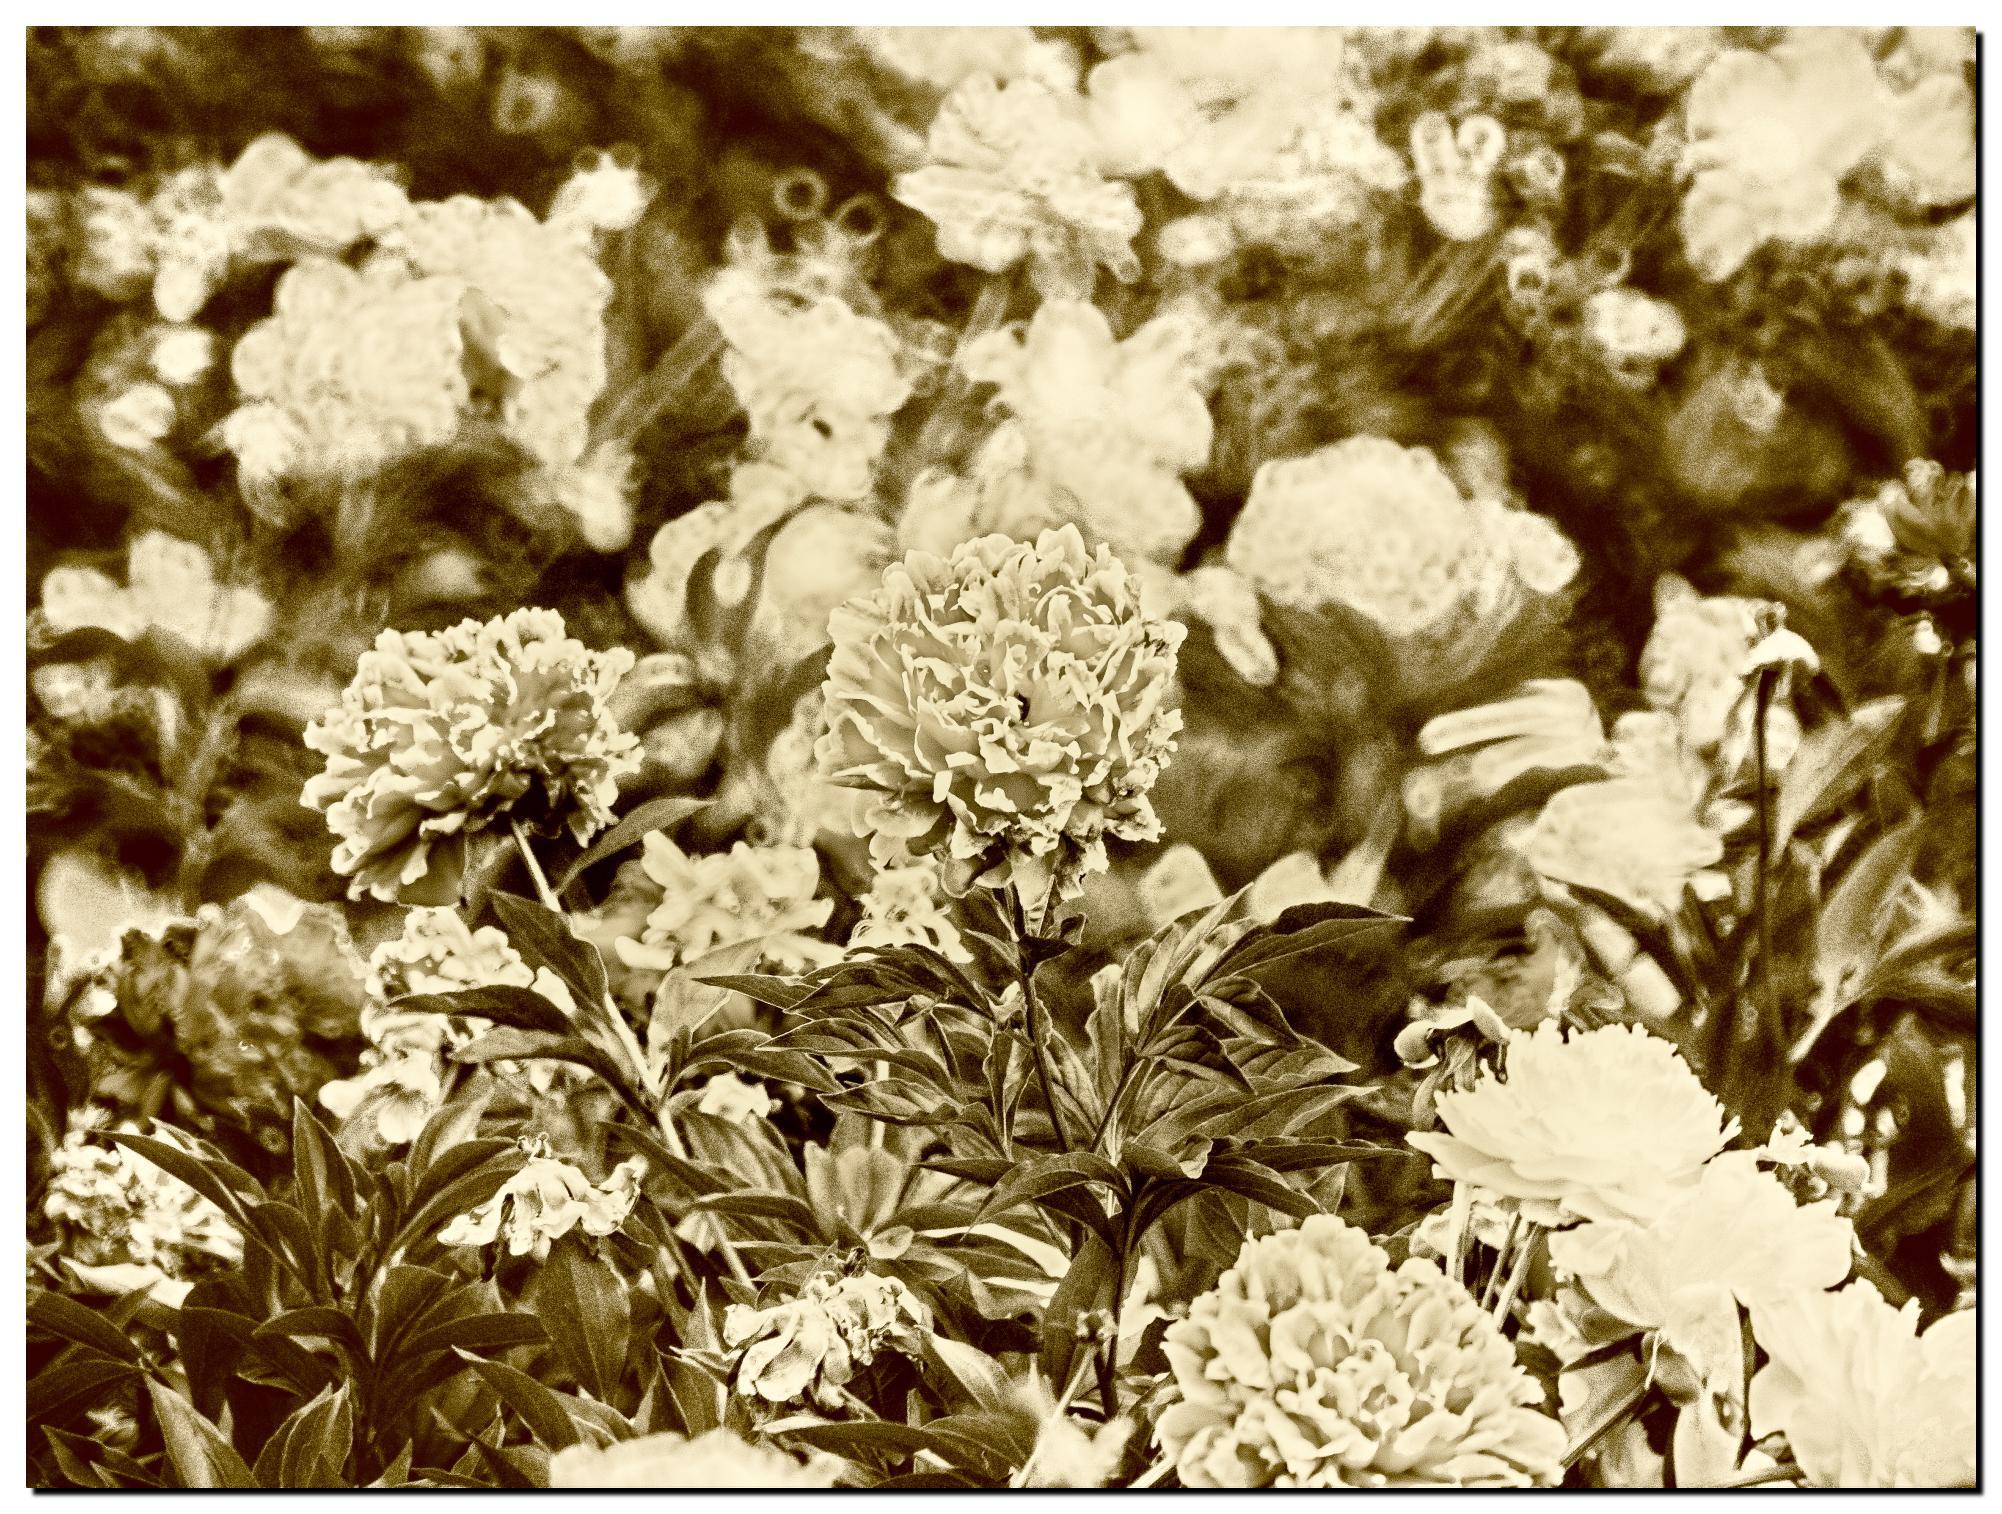 03LR6-P5200591-Edit-2.jpg